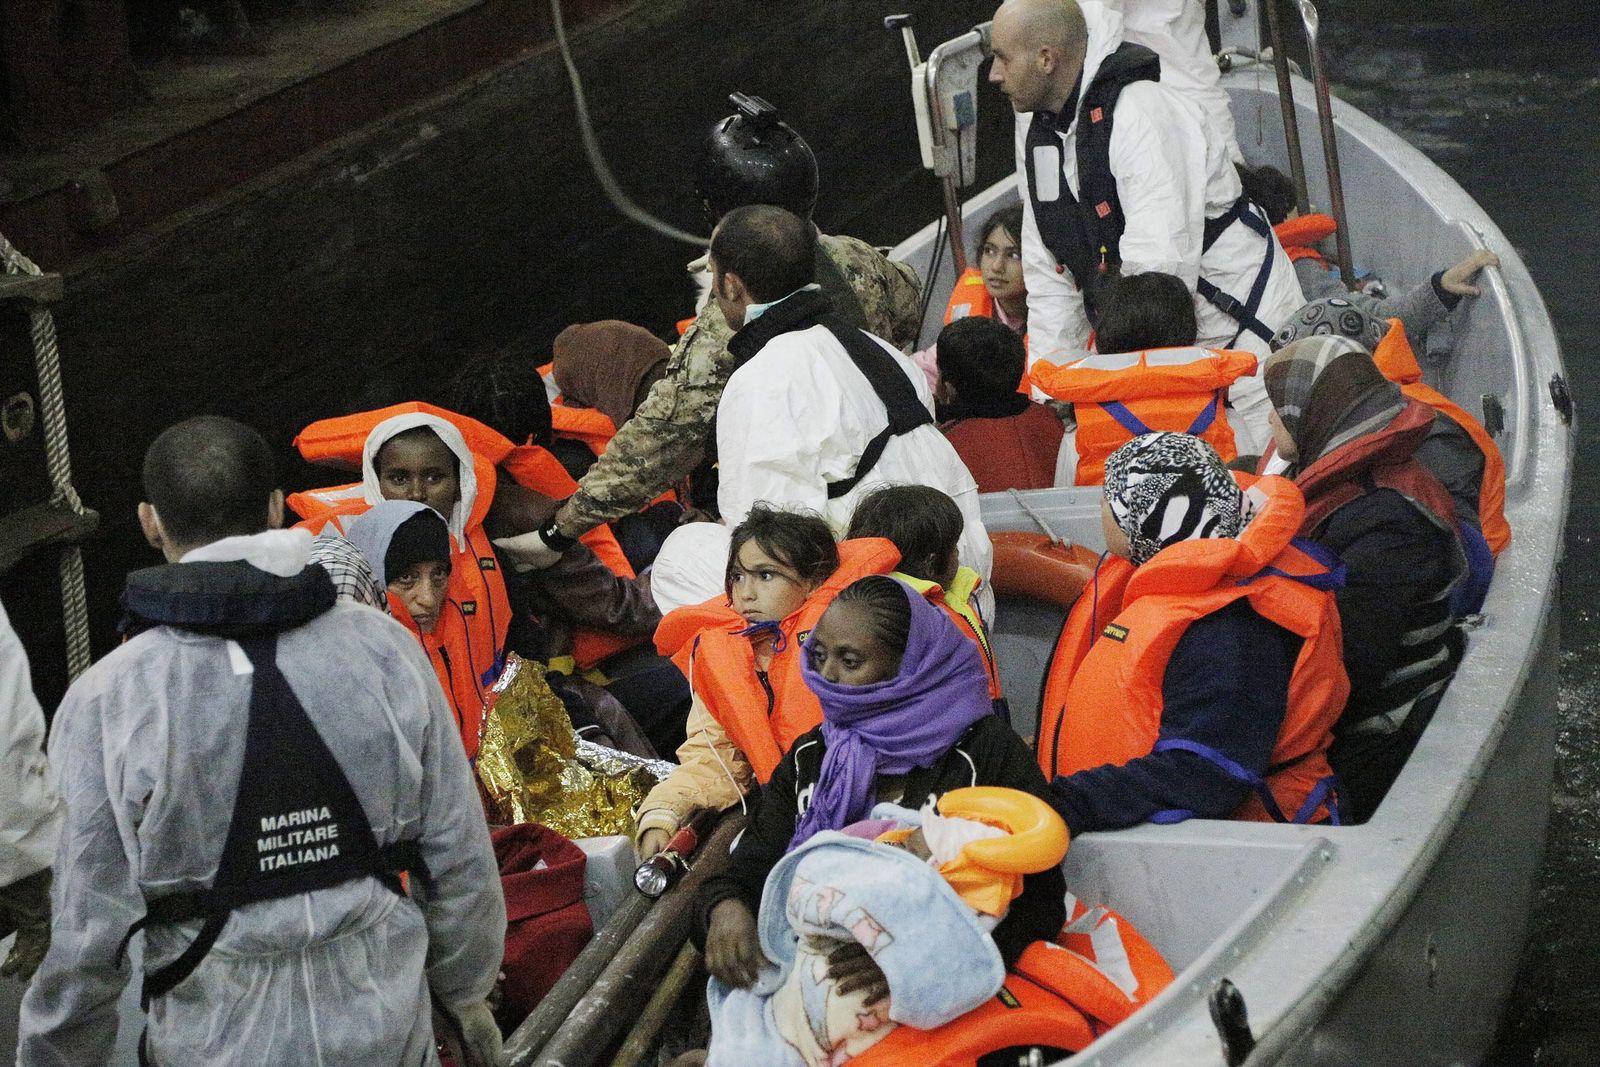 Over 800 migrants intercepted crossing Mediterranean